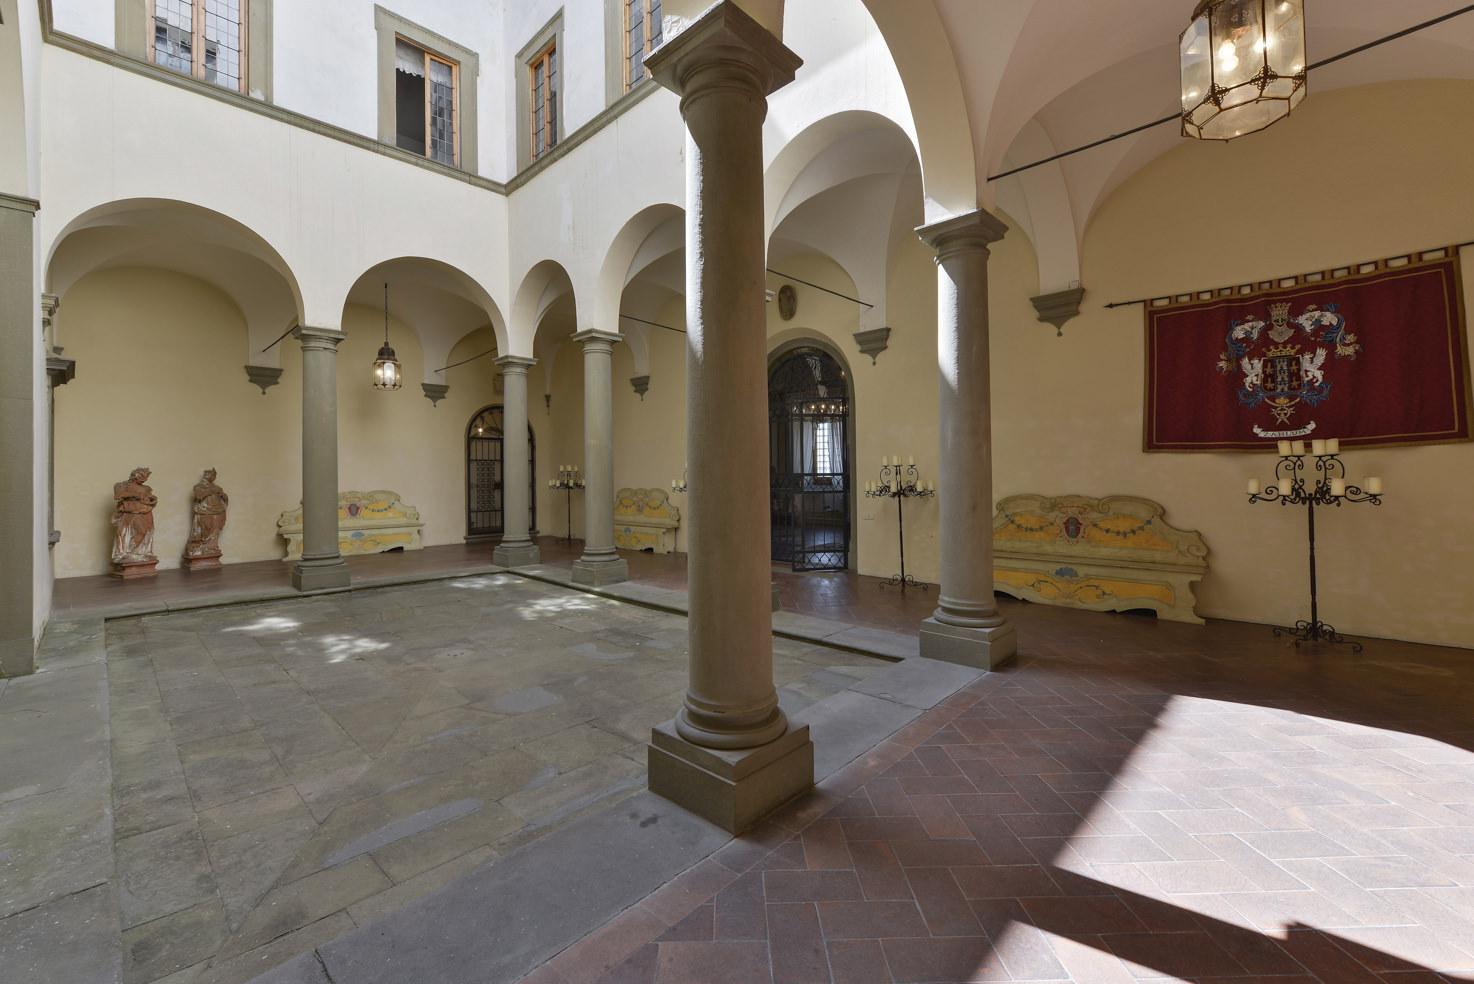 Internal courtyard of Villa Gamberaia